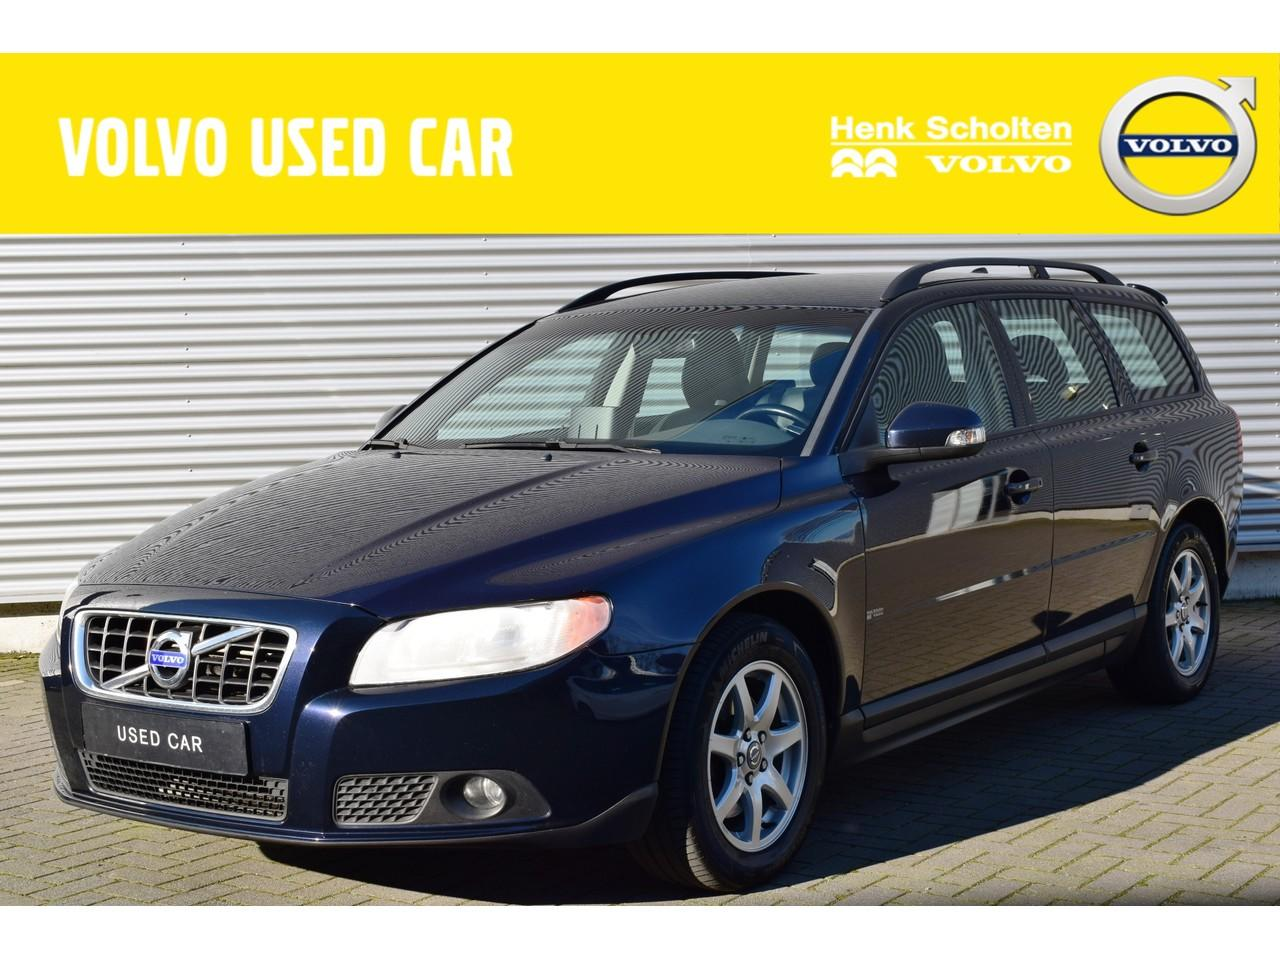 Volvo V70 2.4d aut(6) limited edition plus navi leder